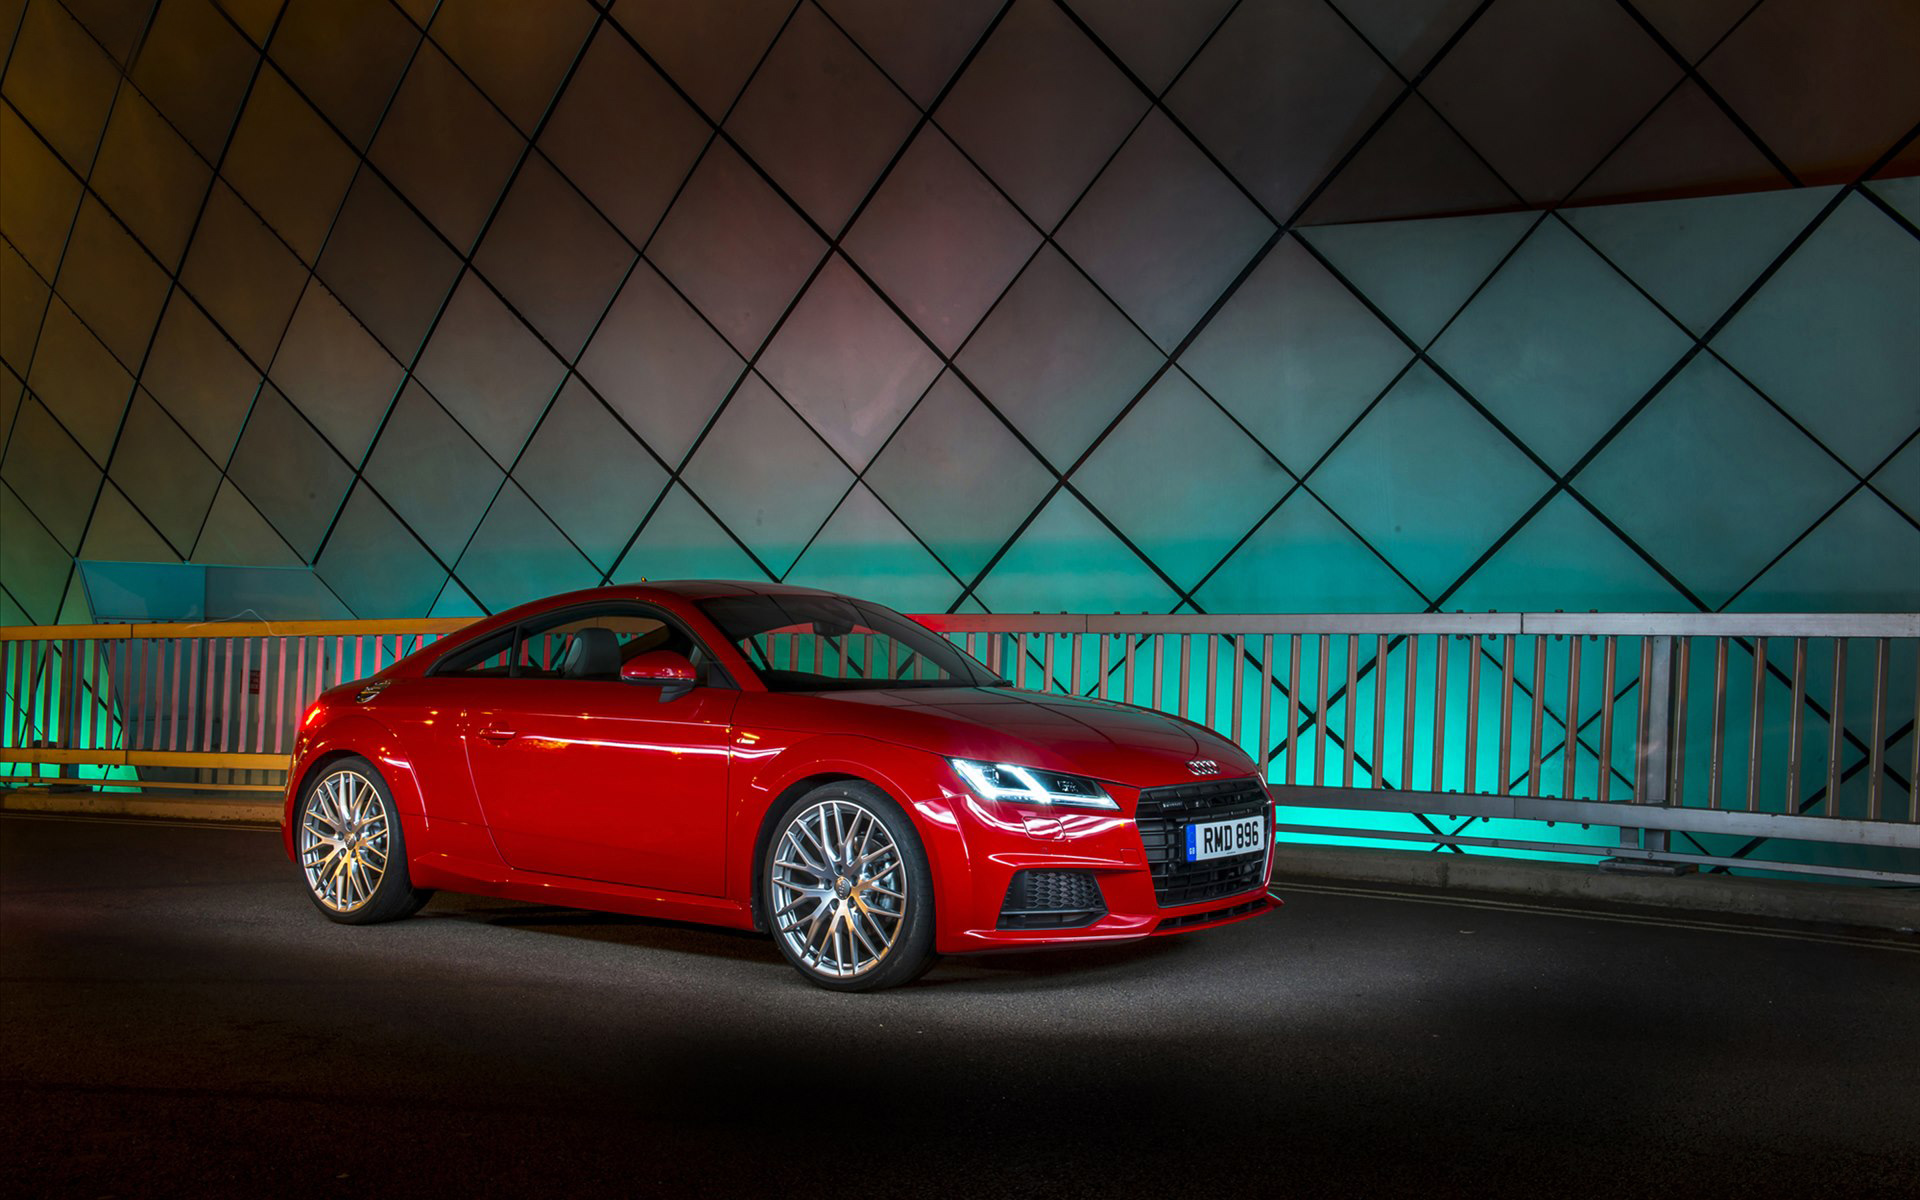 2015 Audi TT Coupe Quattro Wallpaper  HD Car Wallpapers